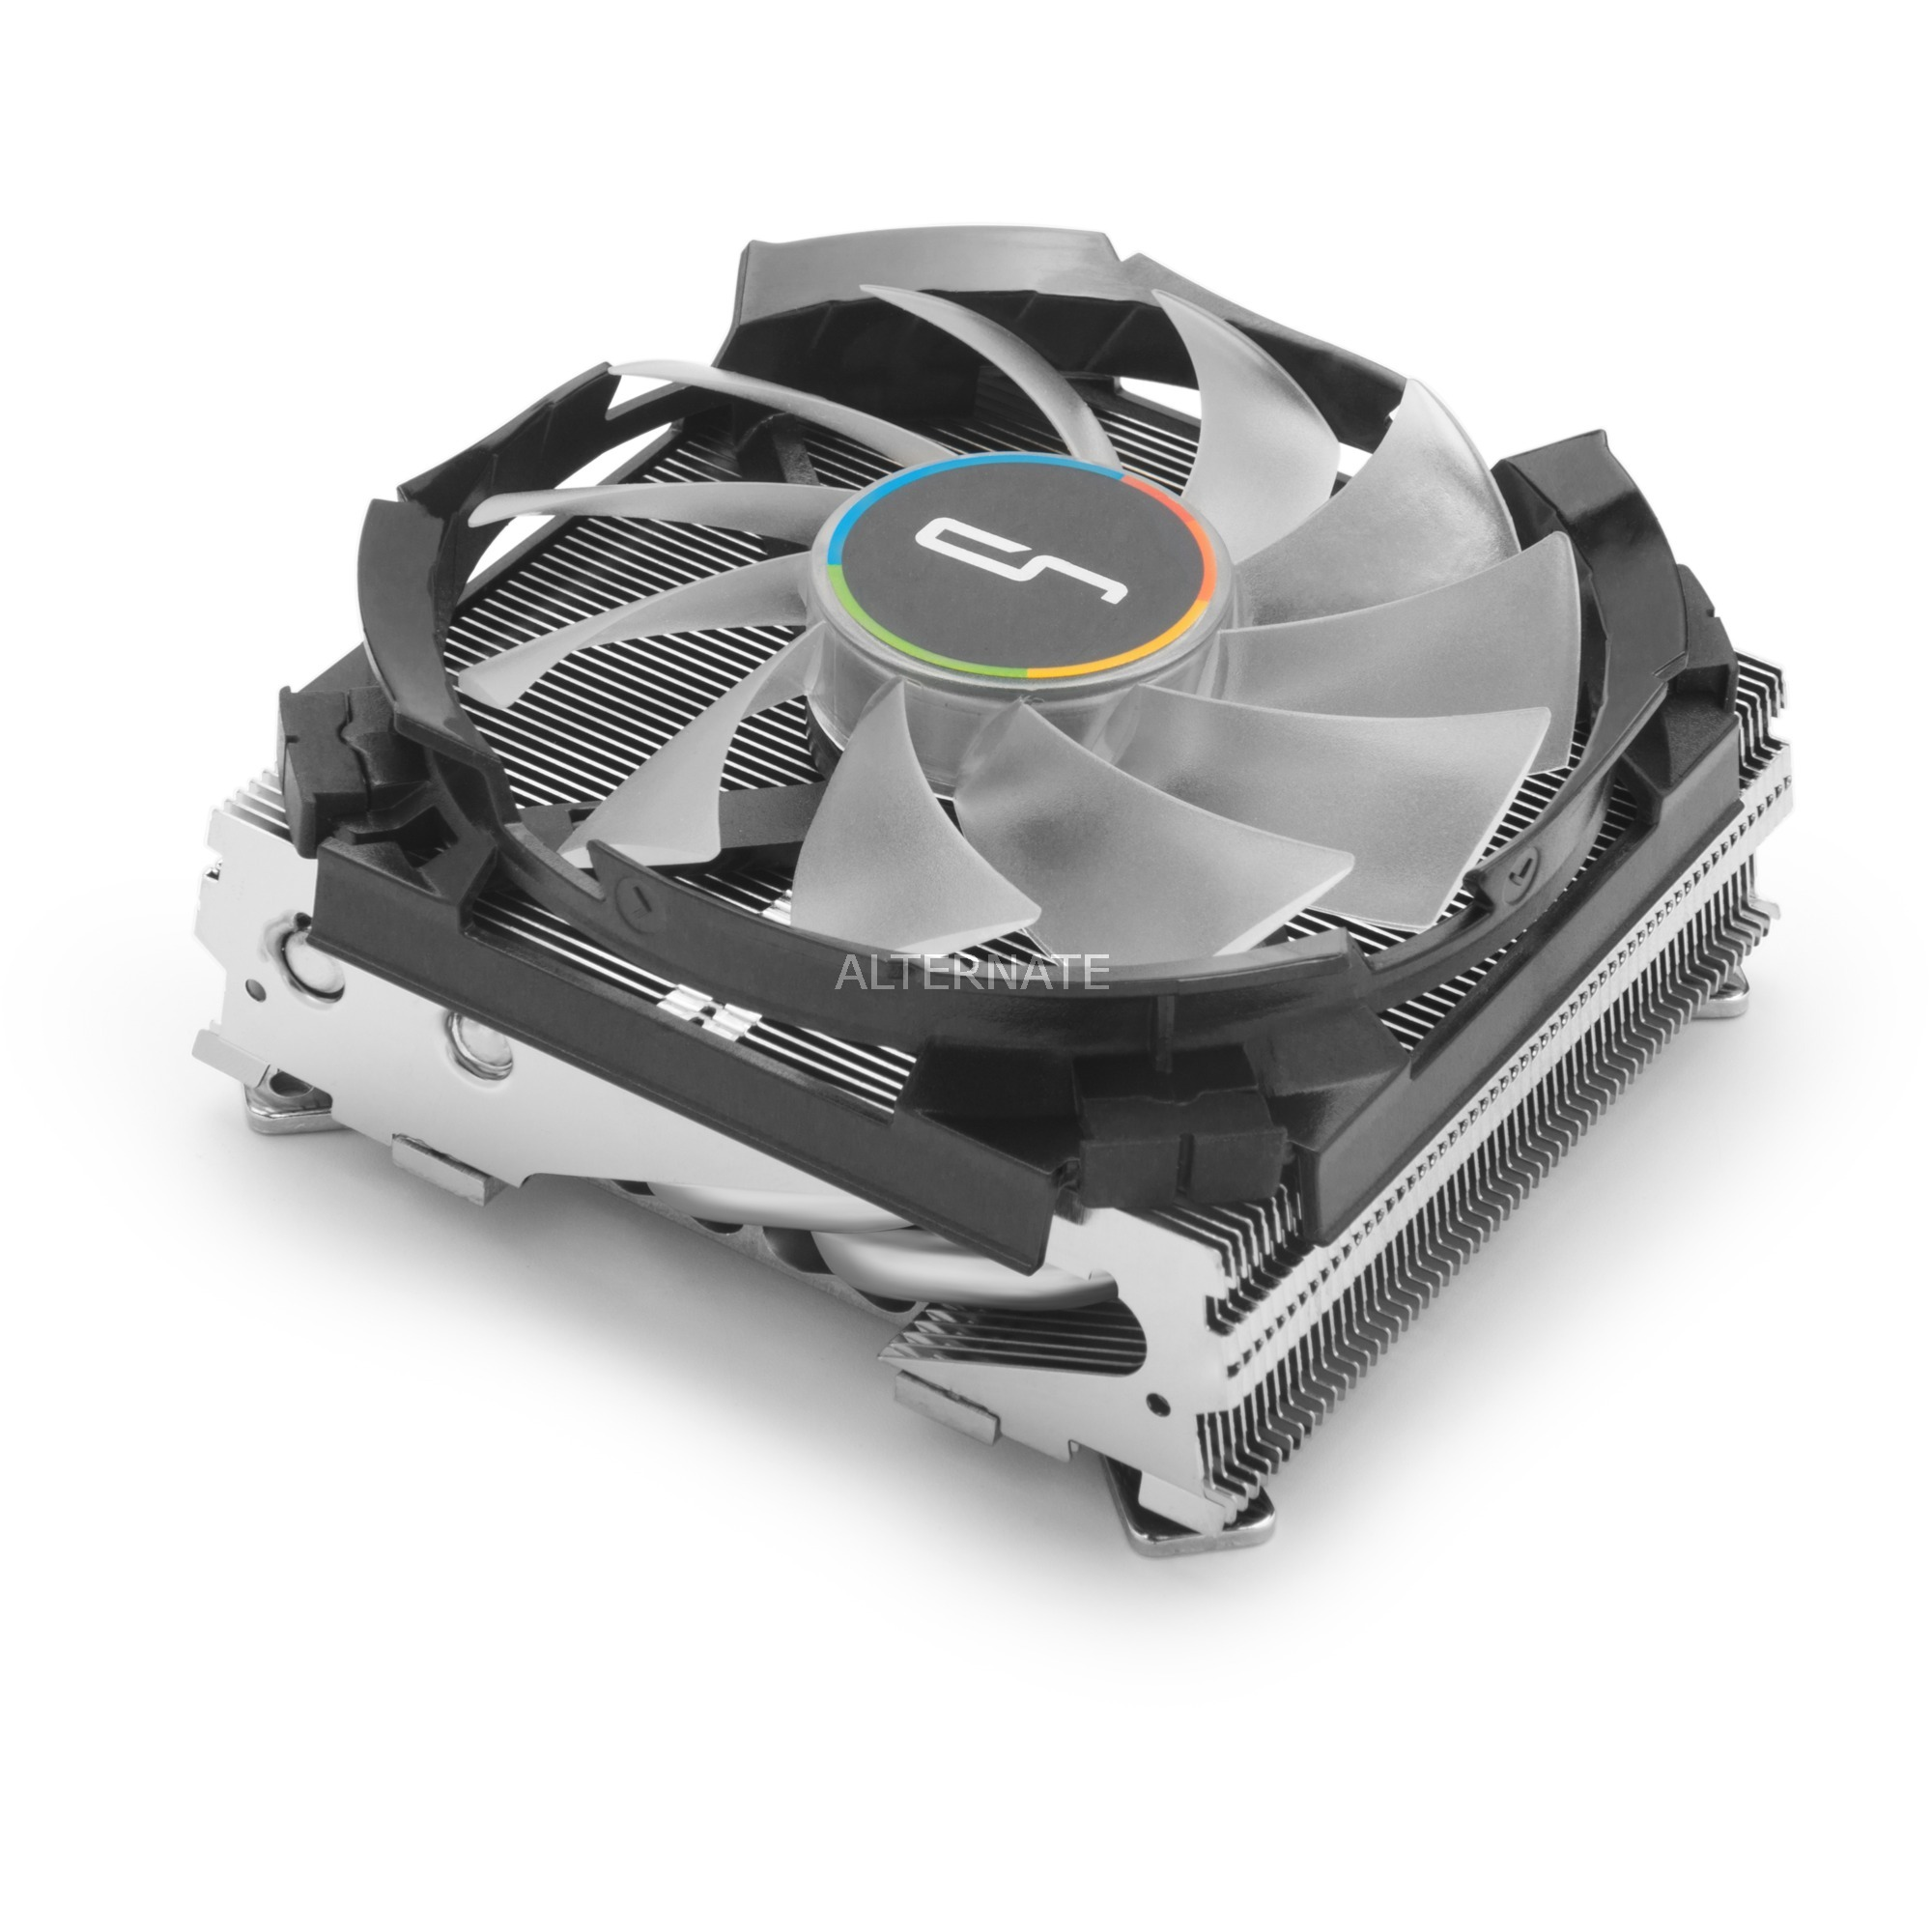 CR-C7R ventilador de PC Procesador Enfriador, Disipador de CPU